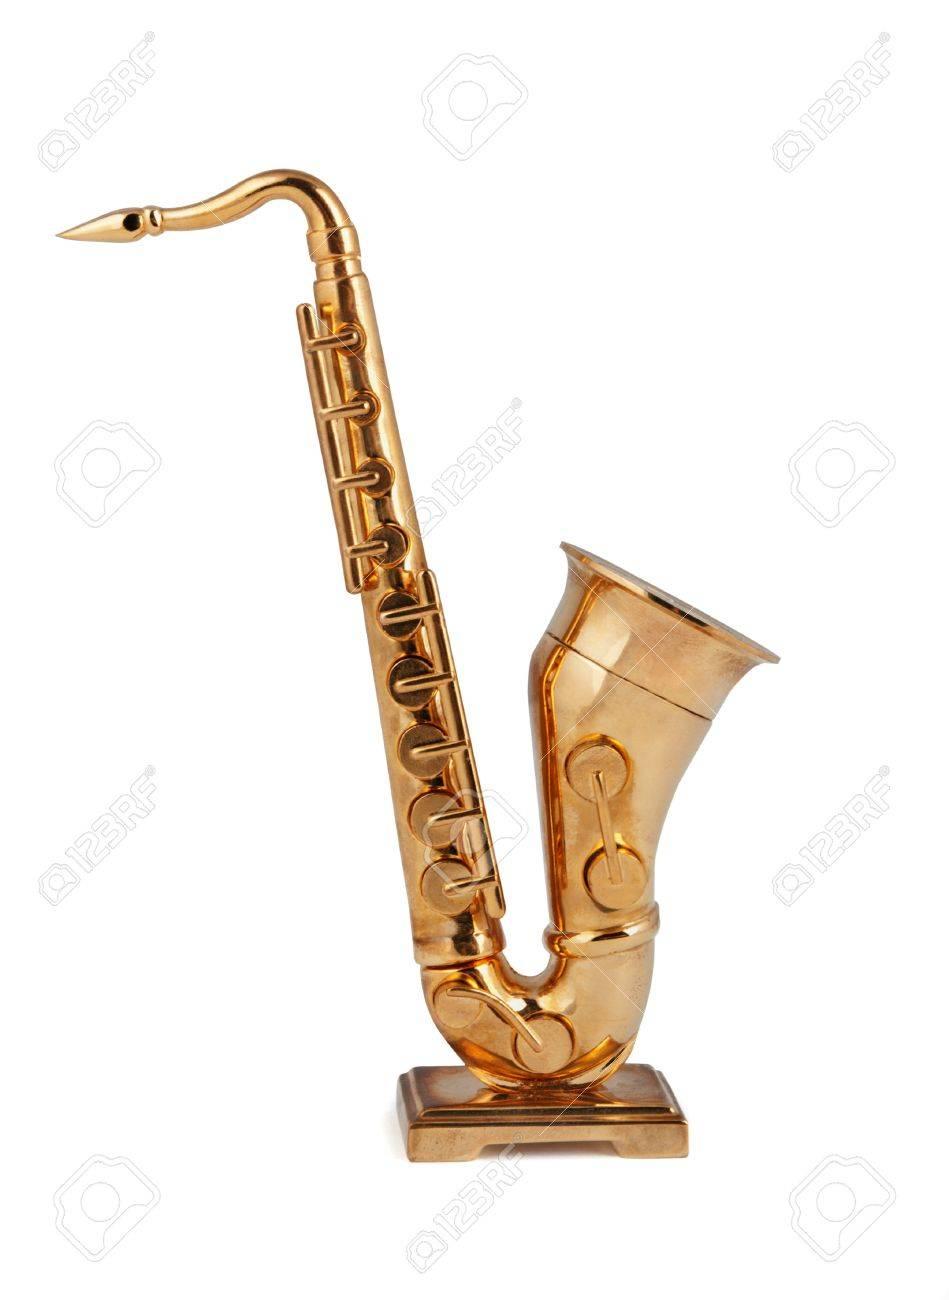 Saxophone figurine on a white background Stock Photo - 16675361